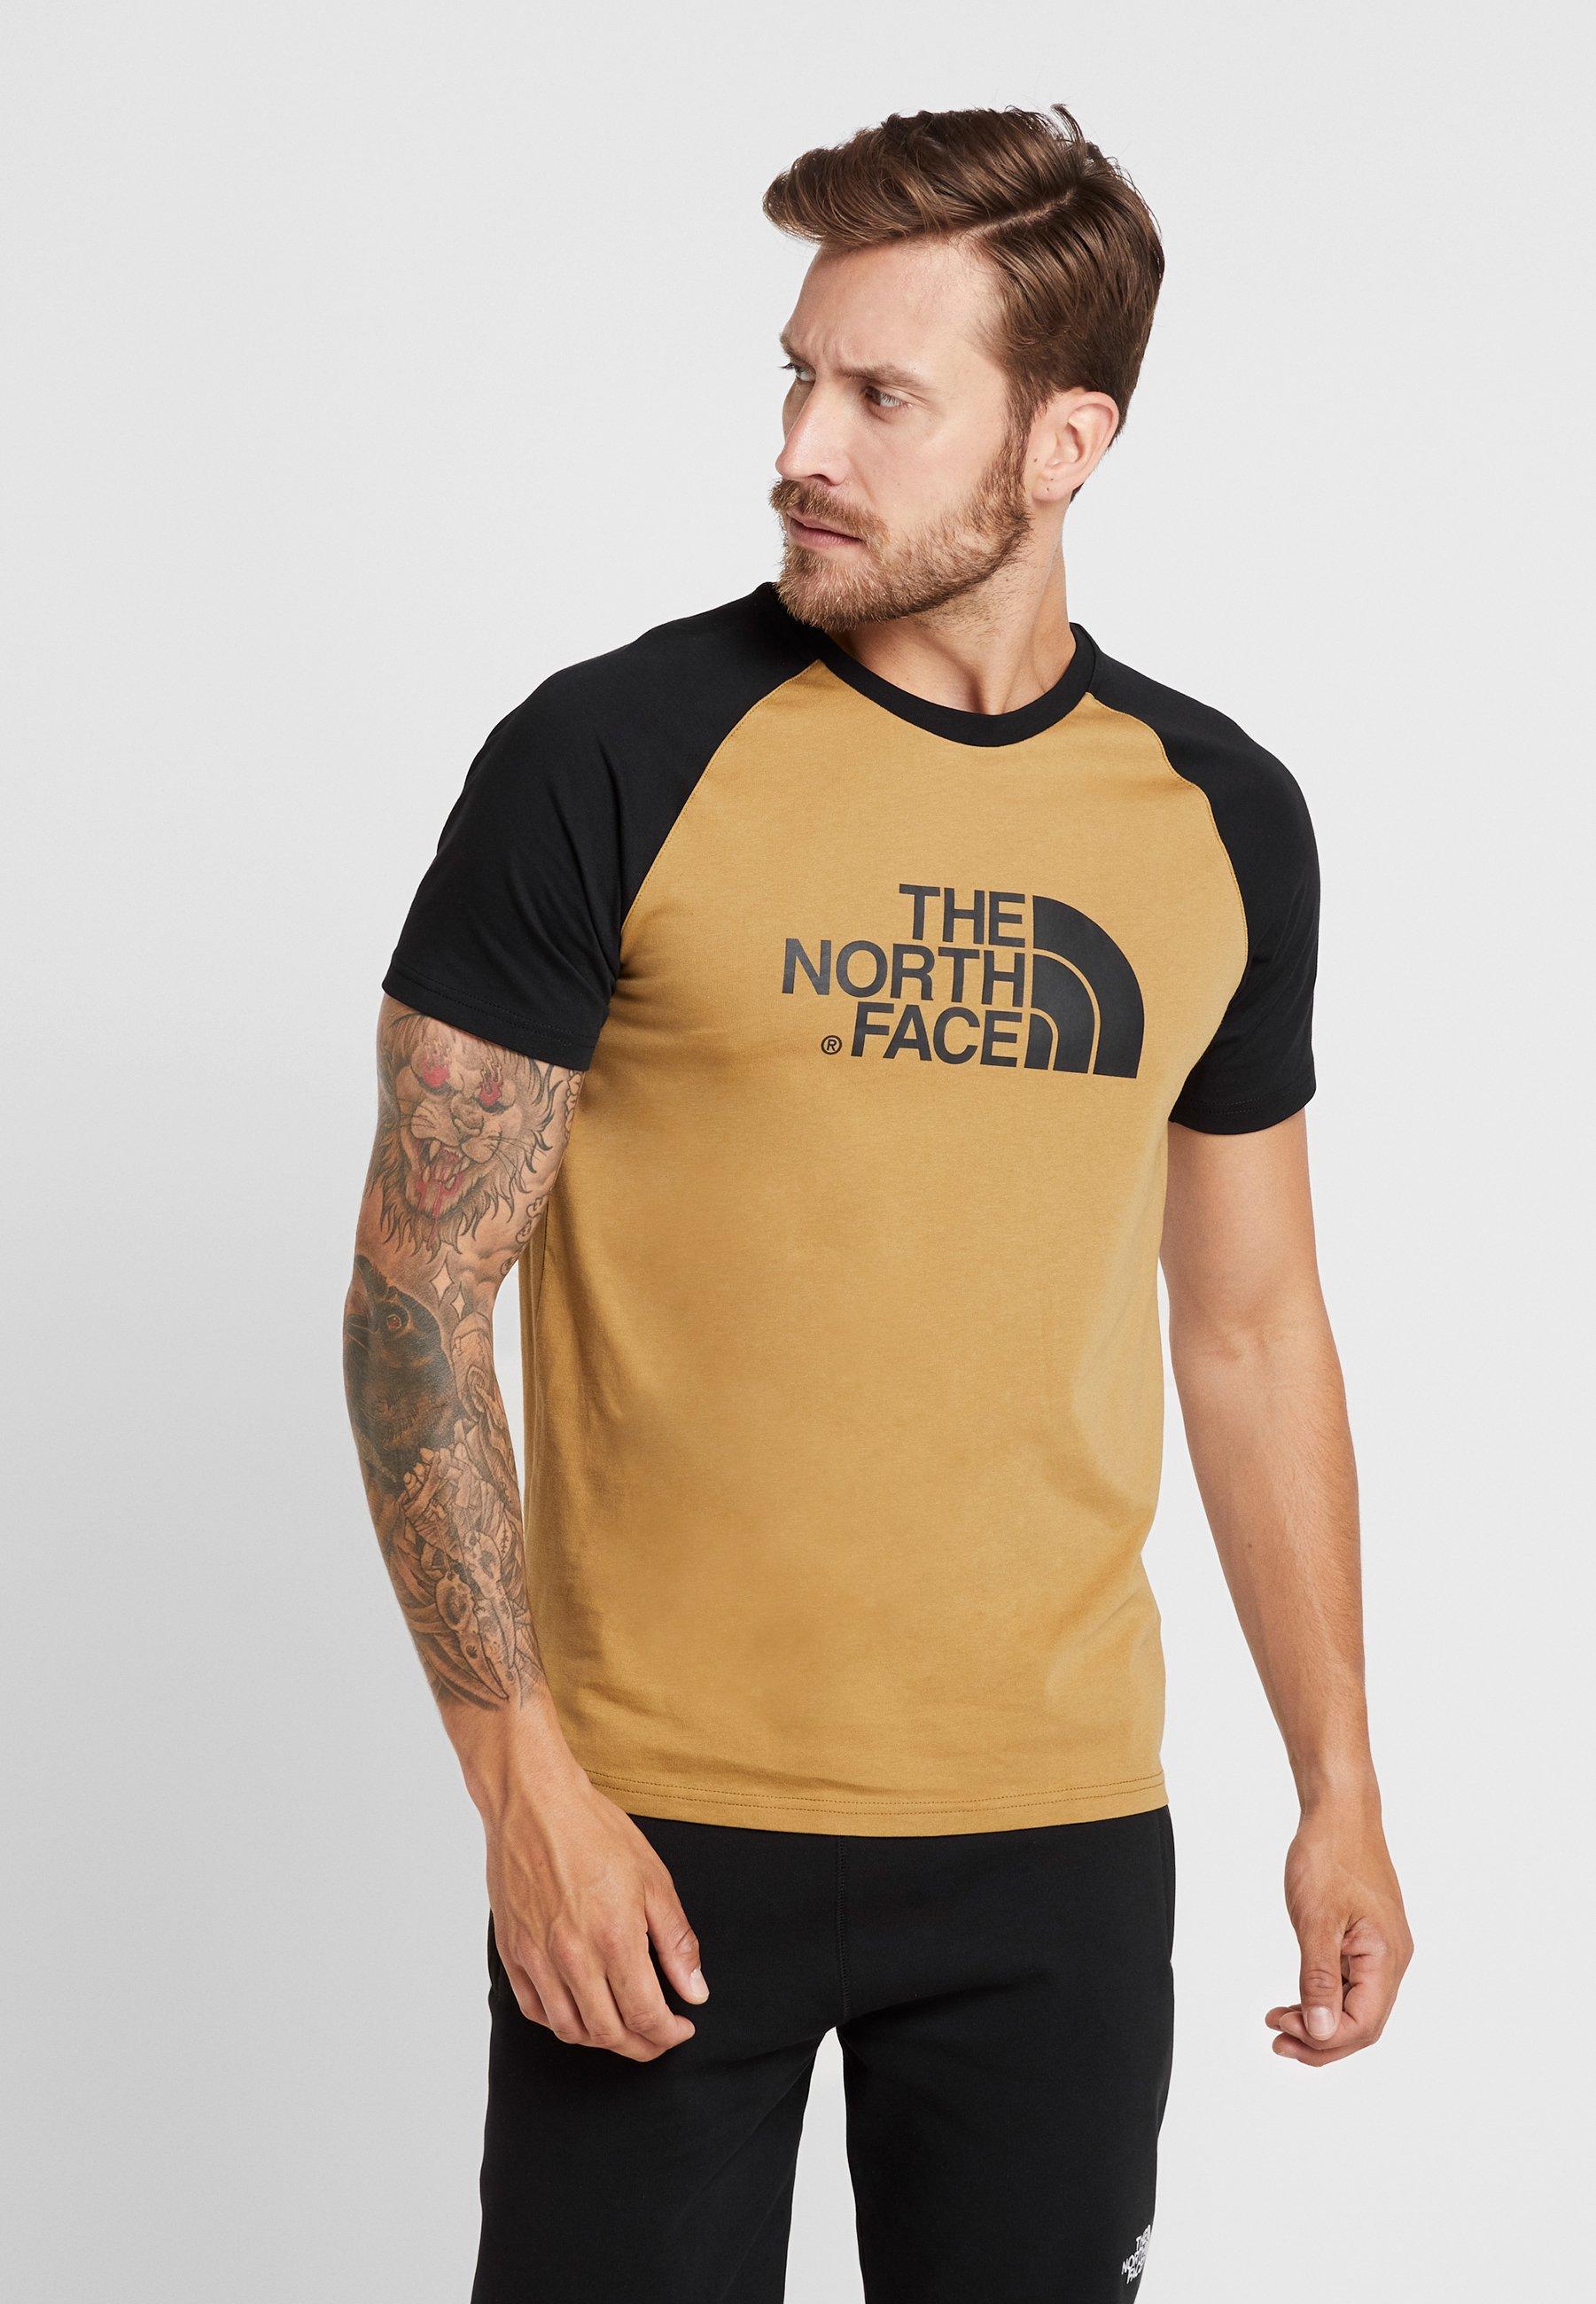 The Face TeeT Stampa Raglan Easy shirt Khaki British North Con qzpSVMUGjL